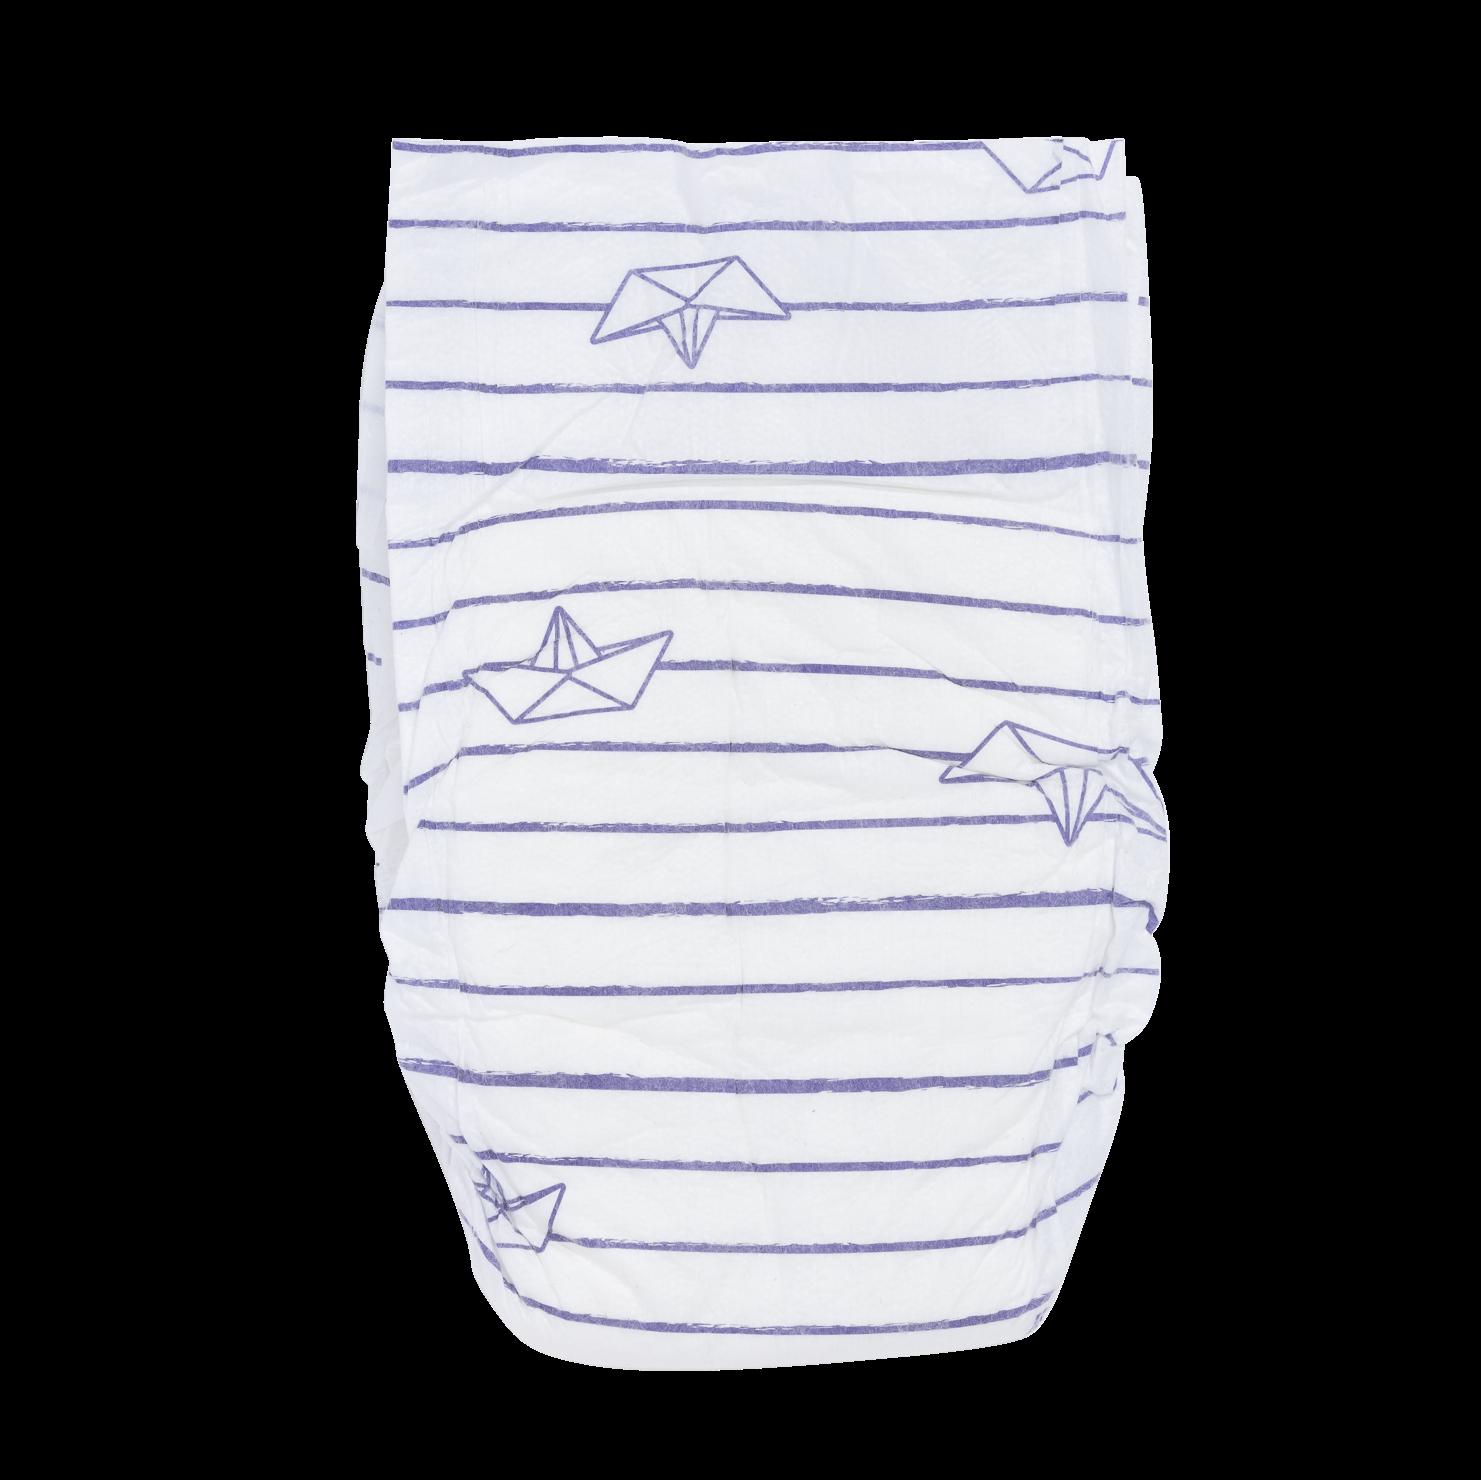 Couches motif Malo T2 / 3-5 kg, Joone (x 32)